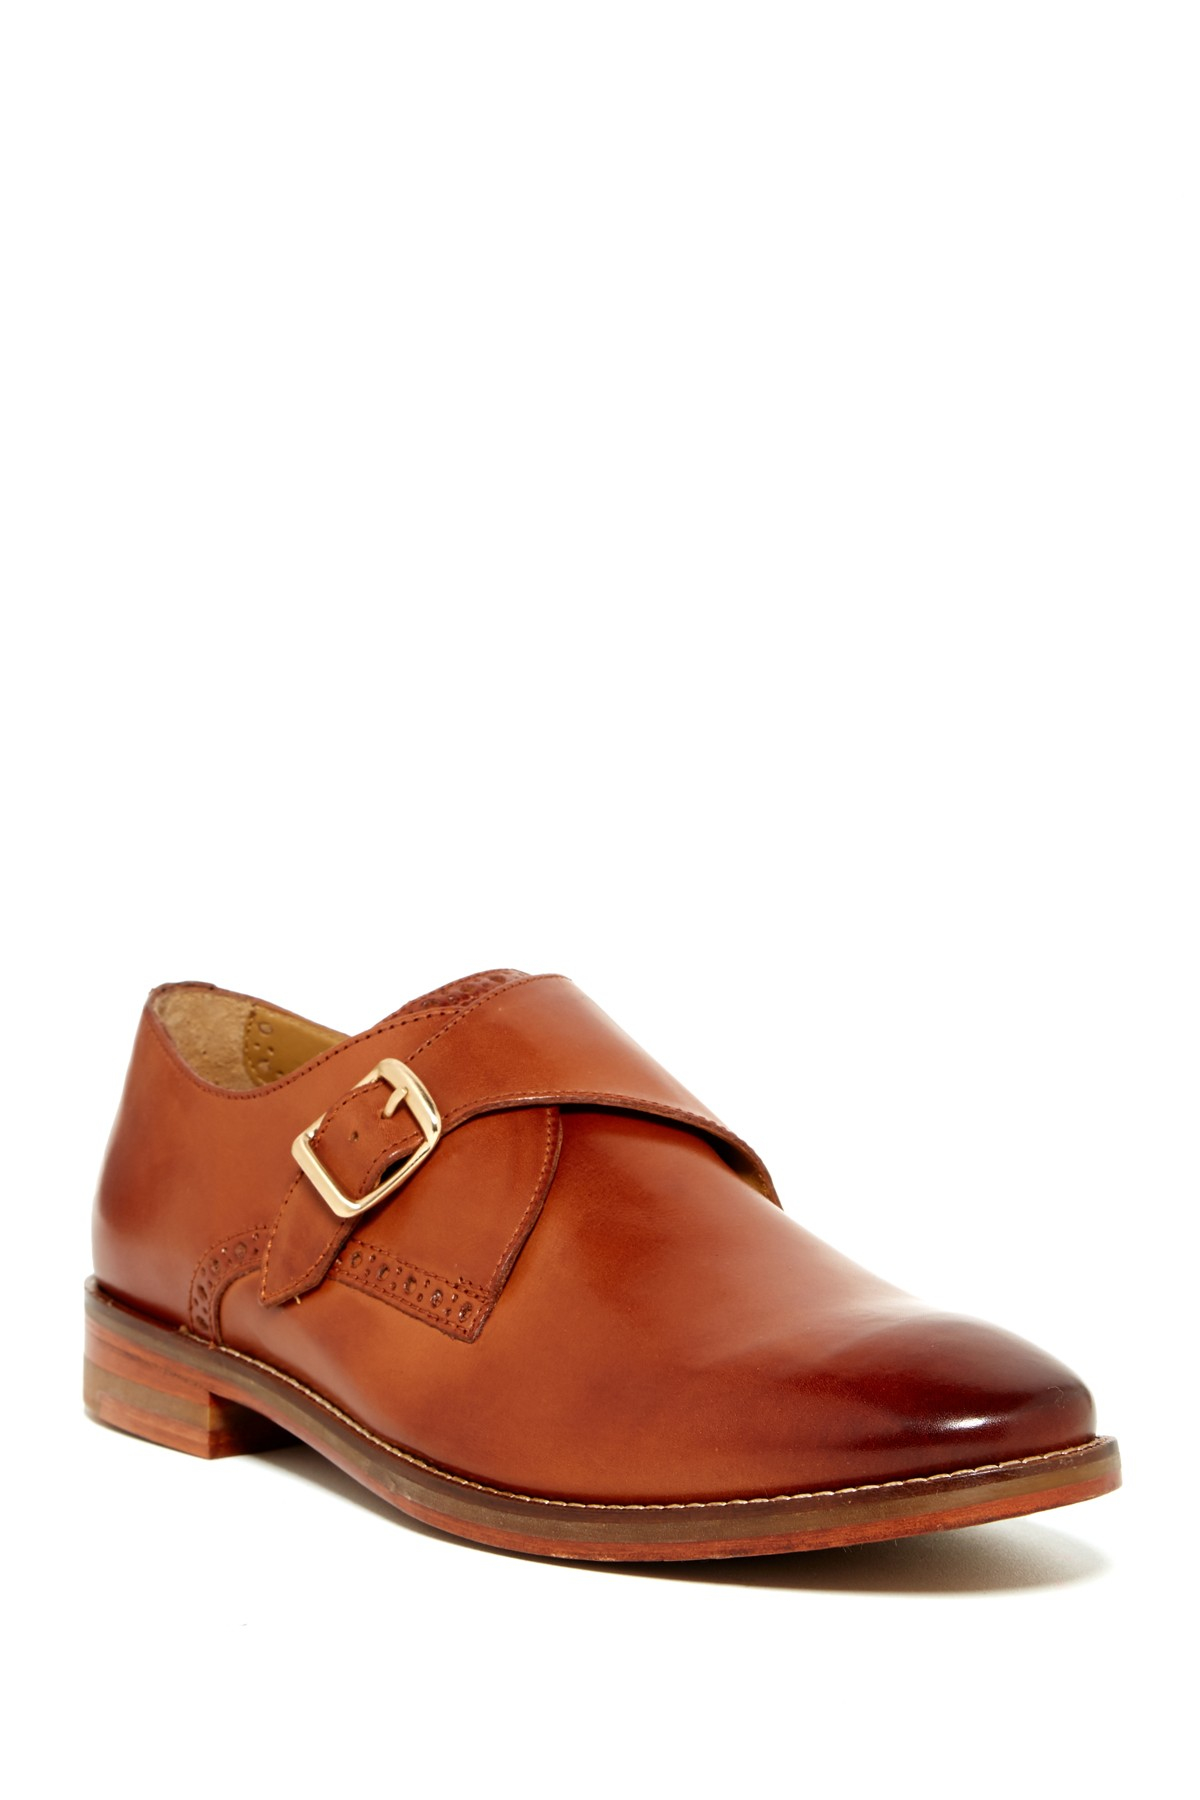 Cole haan Cambridge Double Monk-strap Shoes in Black for Men | Lyst